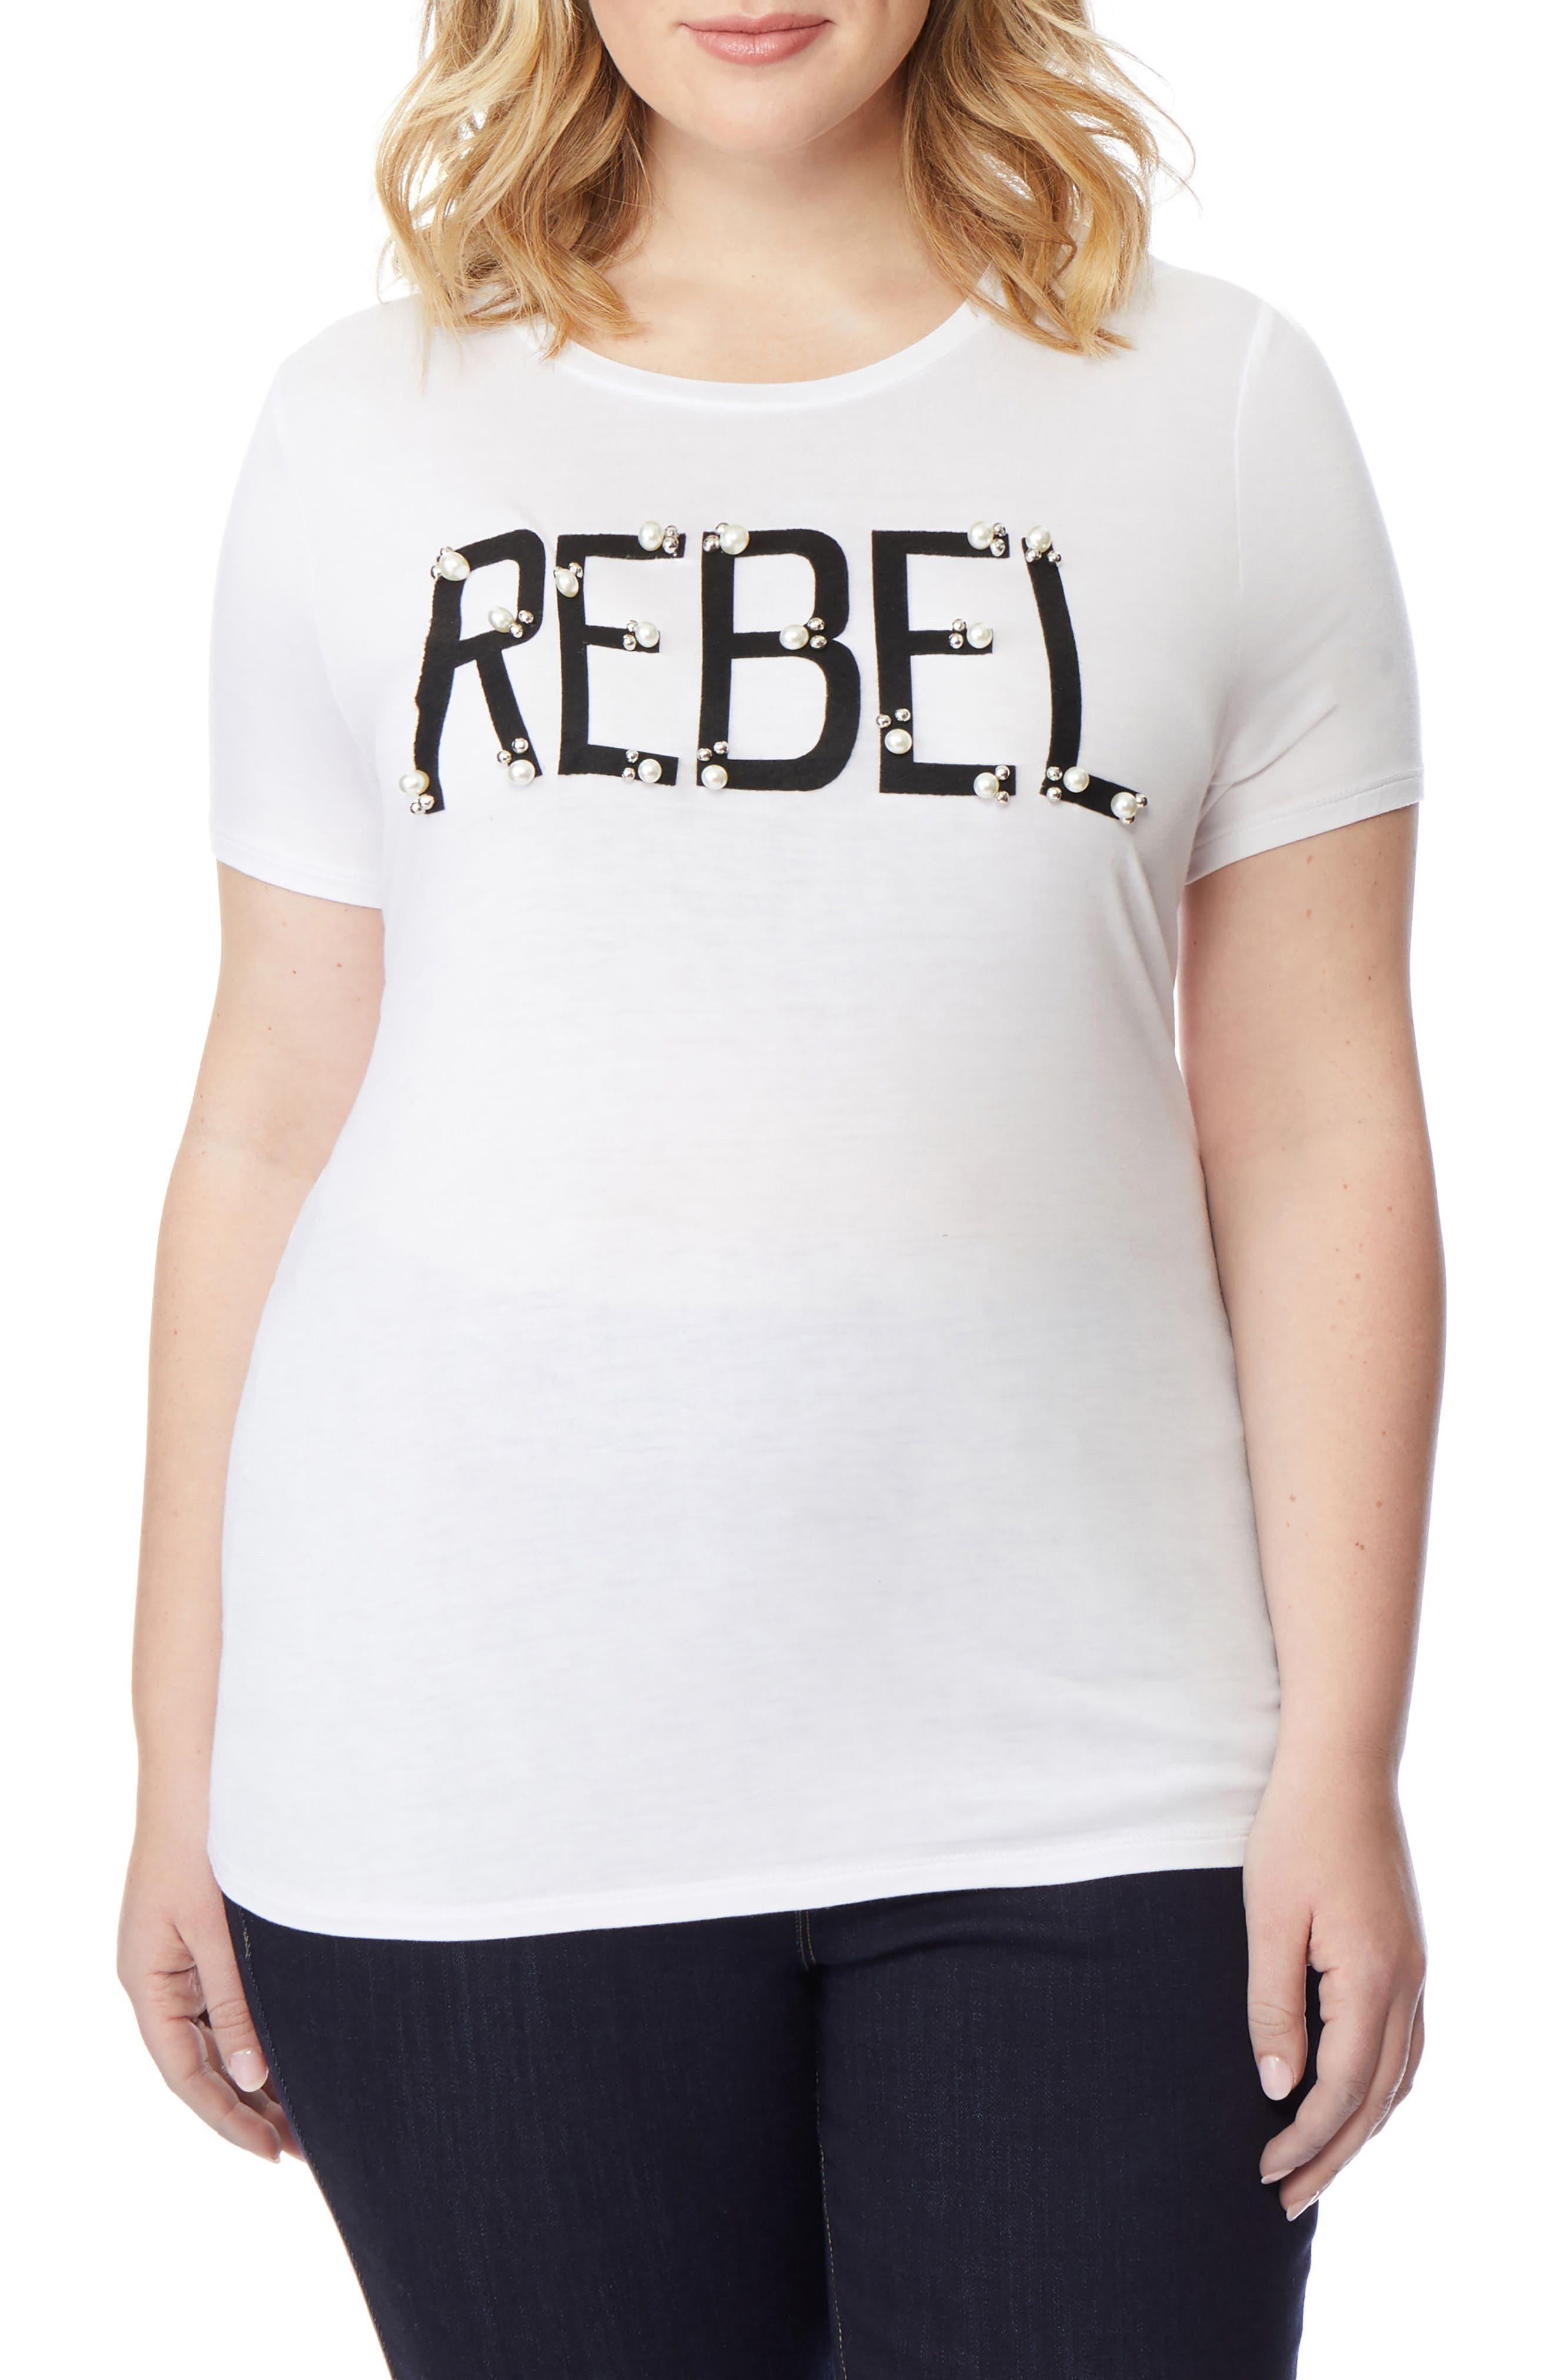 Rebel Embellished Graphic Tee,                             Main thumbnail 1, color,                             PEARLED REBEL